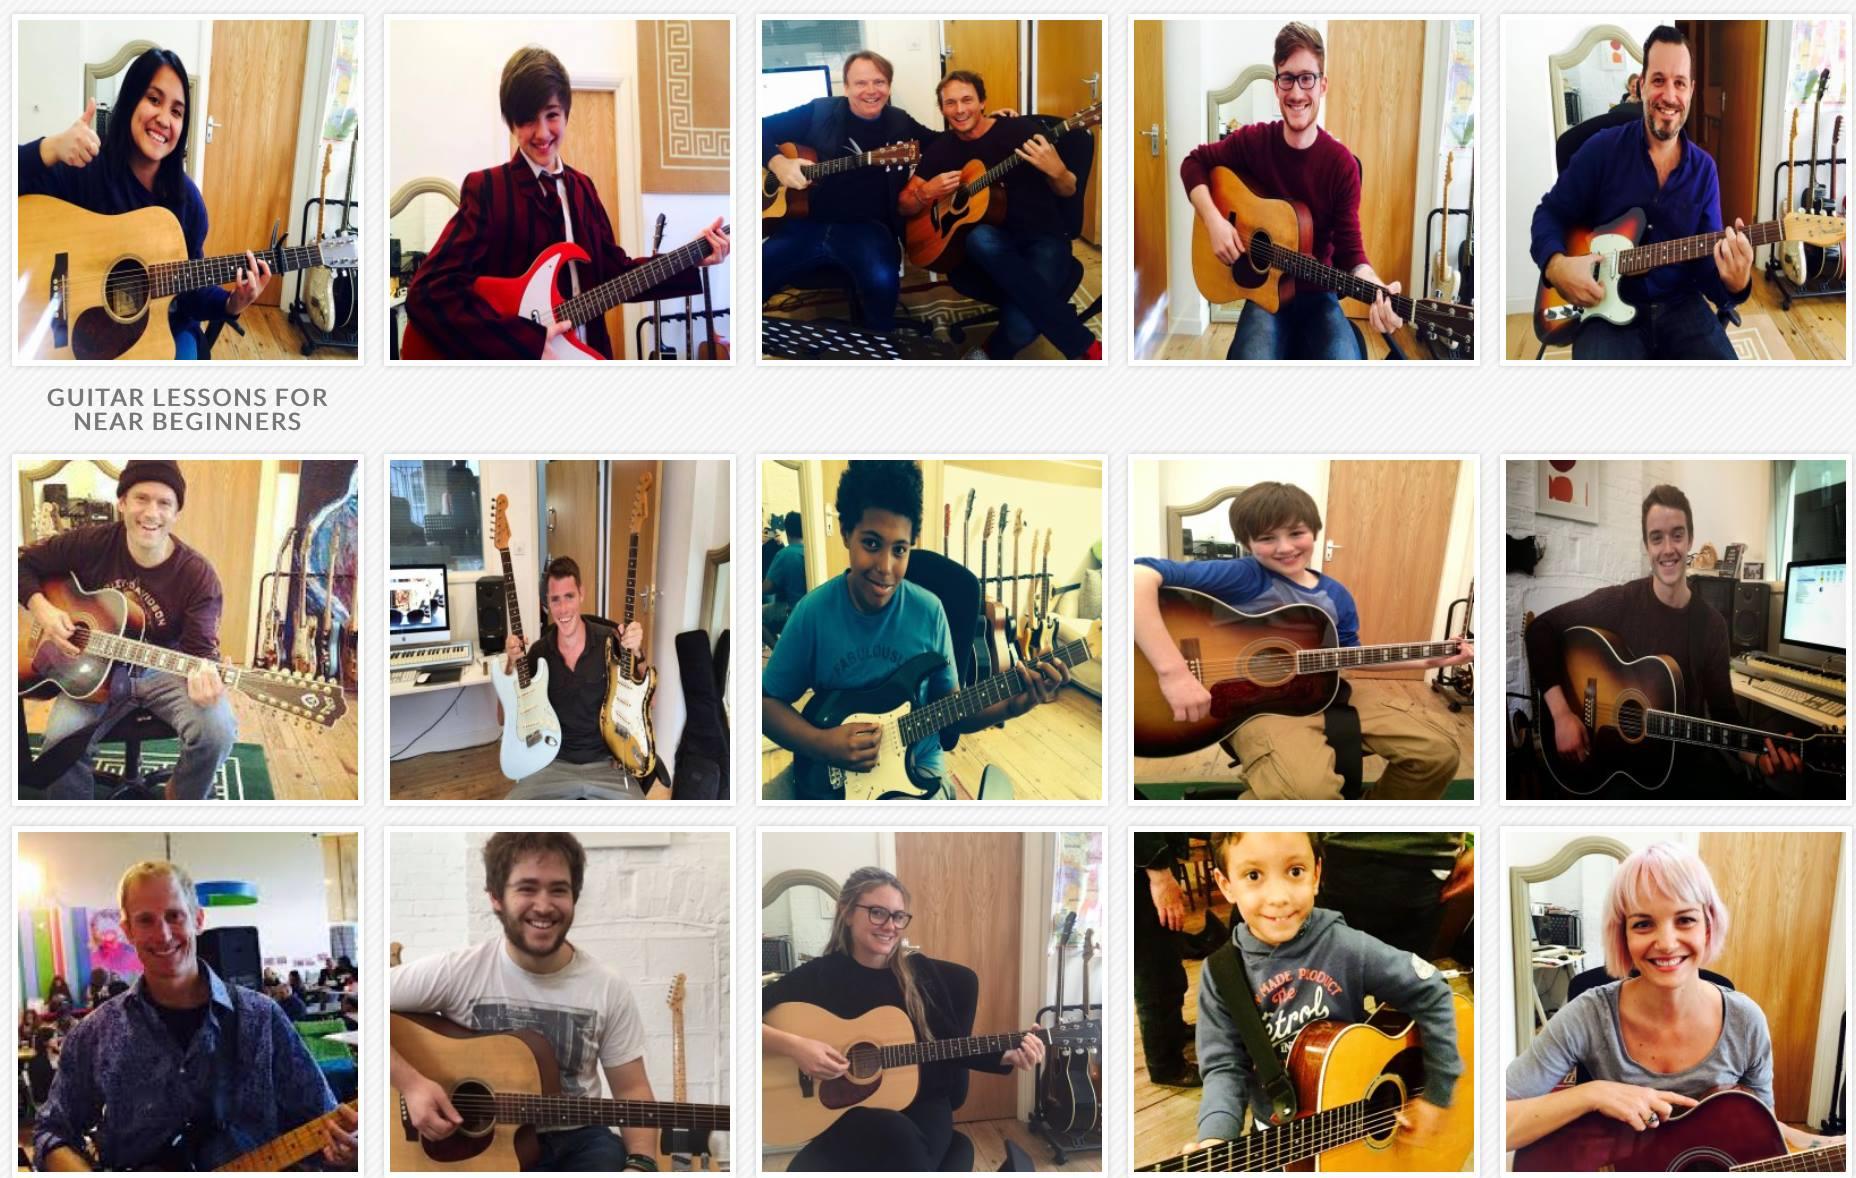 Brighton, Coldean, Falmer, Hollingbury, Patcham, Preston, Stanmer, Withdean